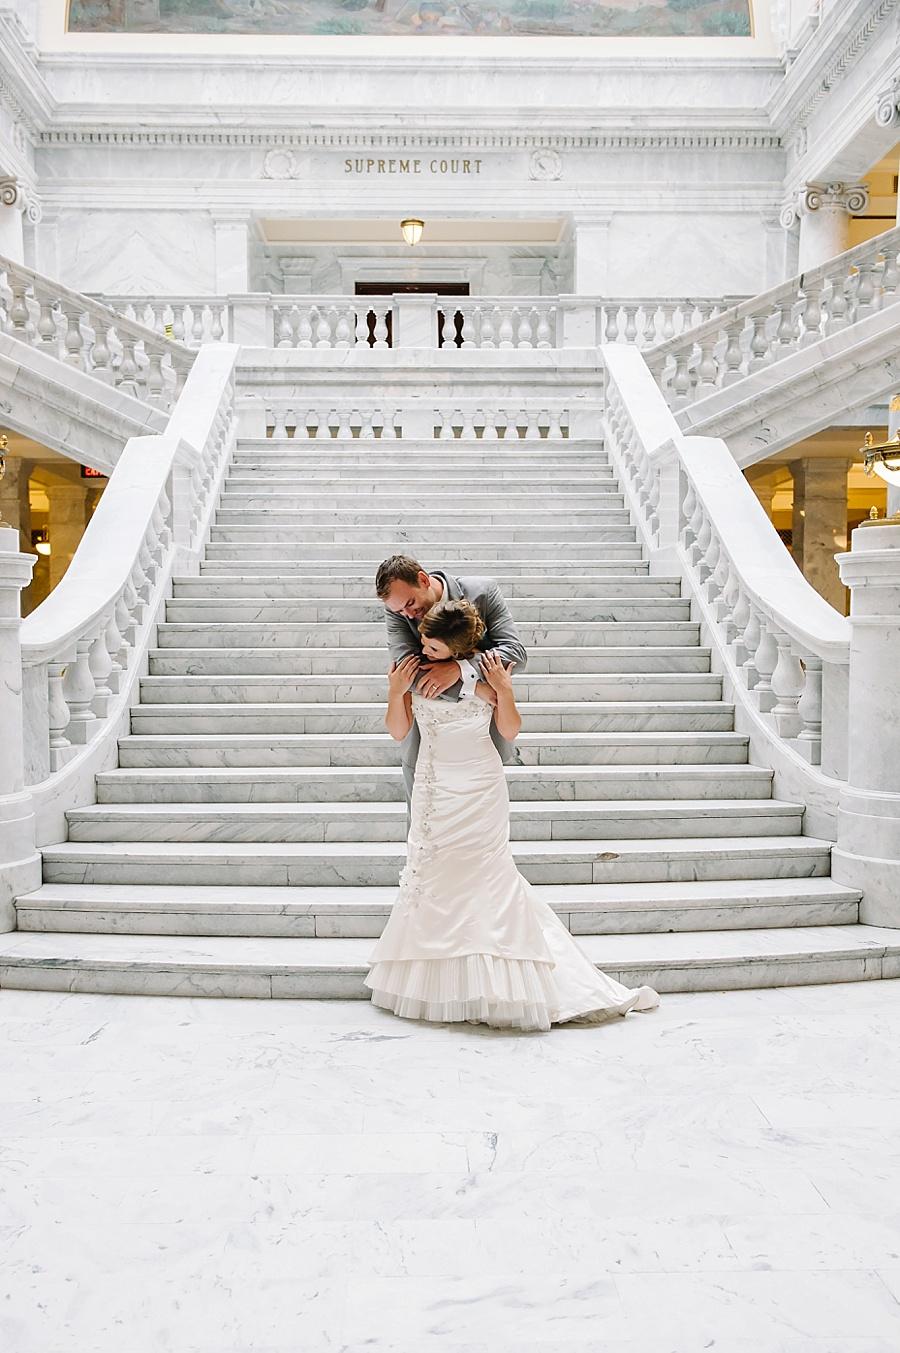 SLC Wedding Photographer Ali Sumsion 1120